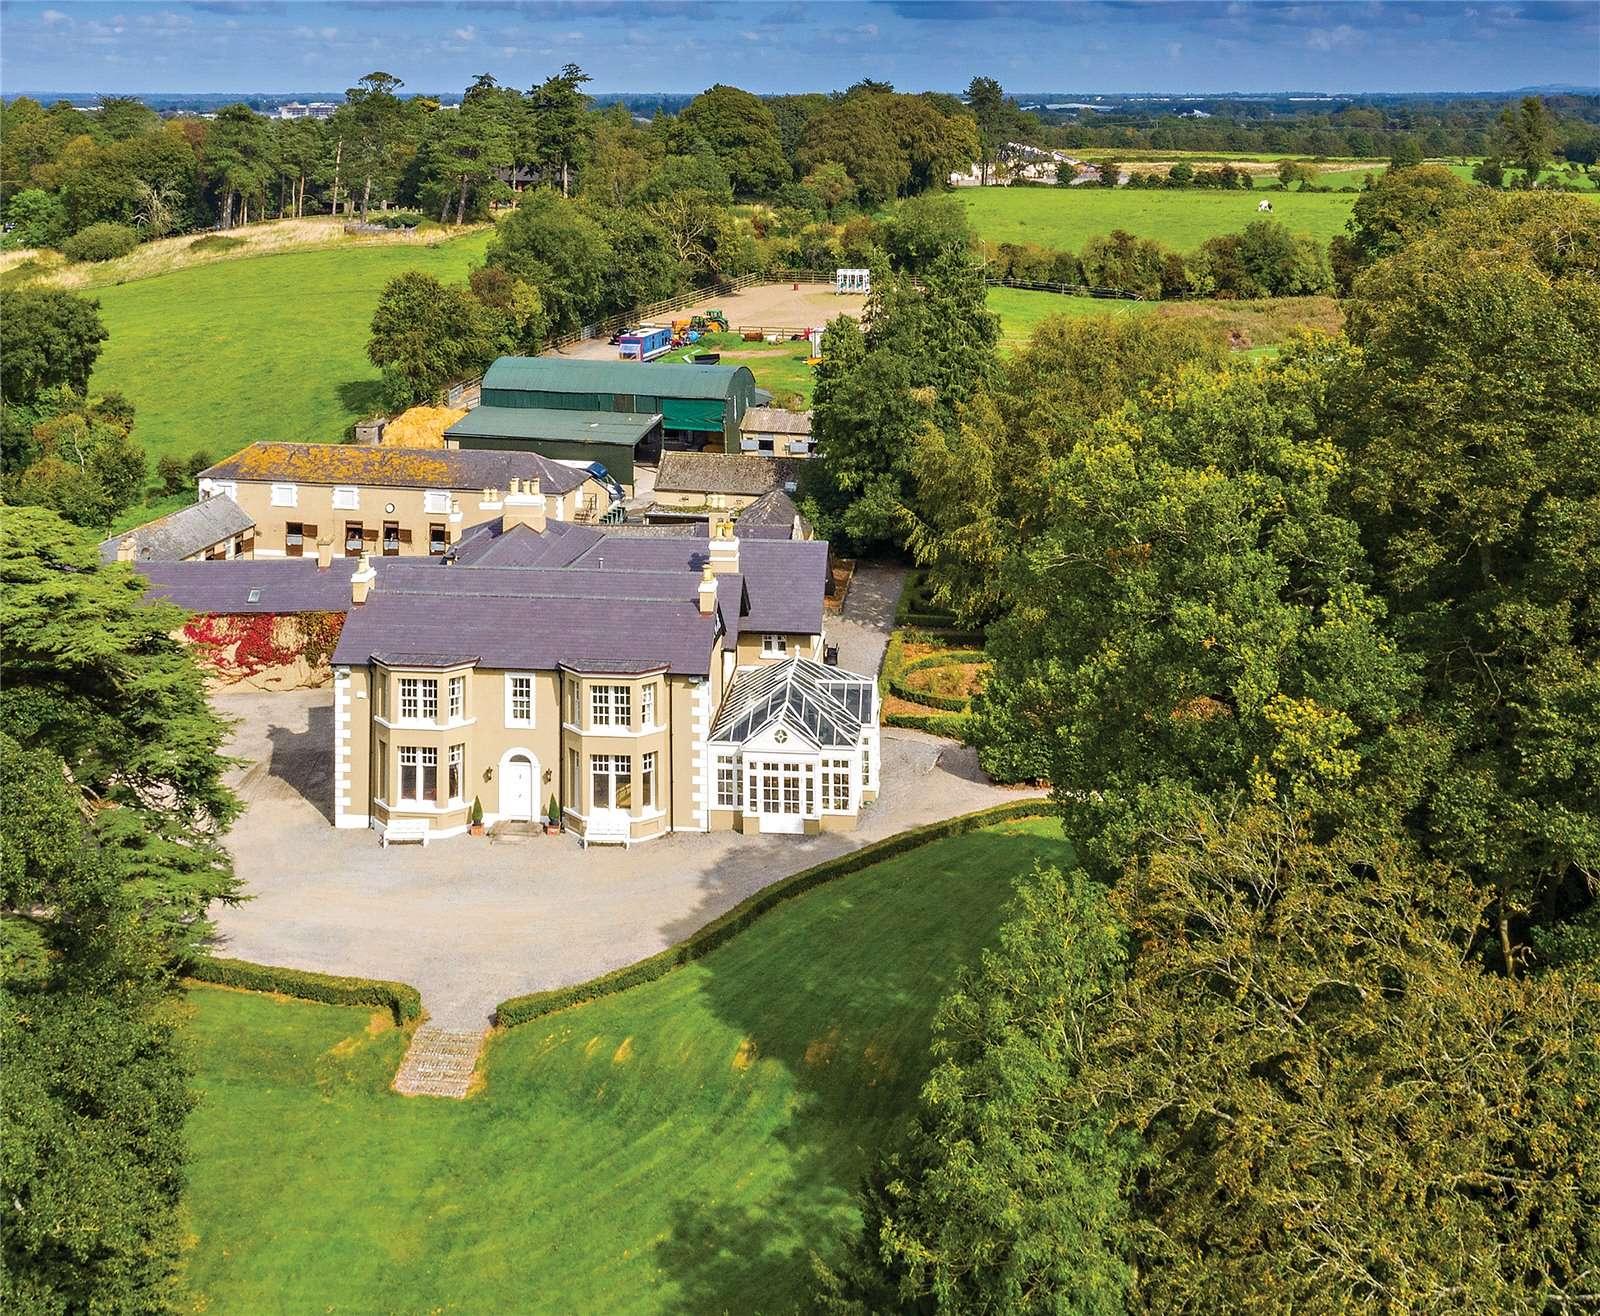 Beech Tree House, The Curragh, Co Kildare, R56 - Savills